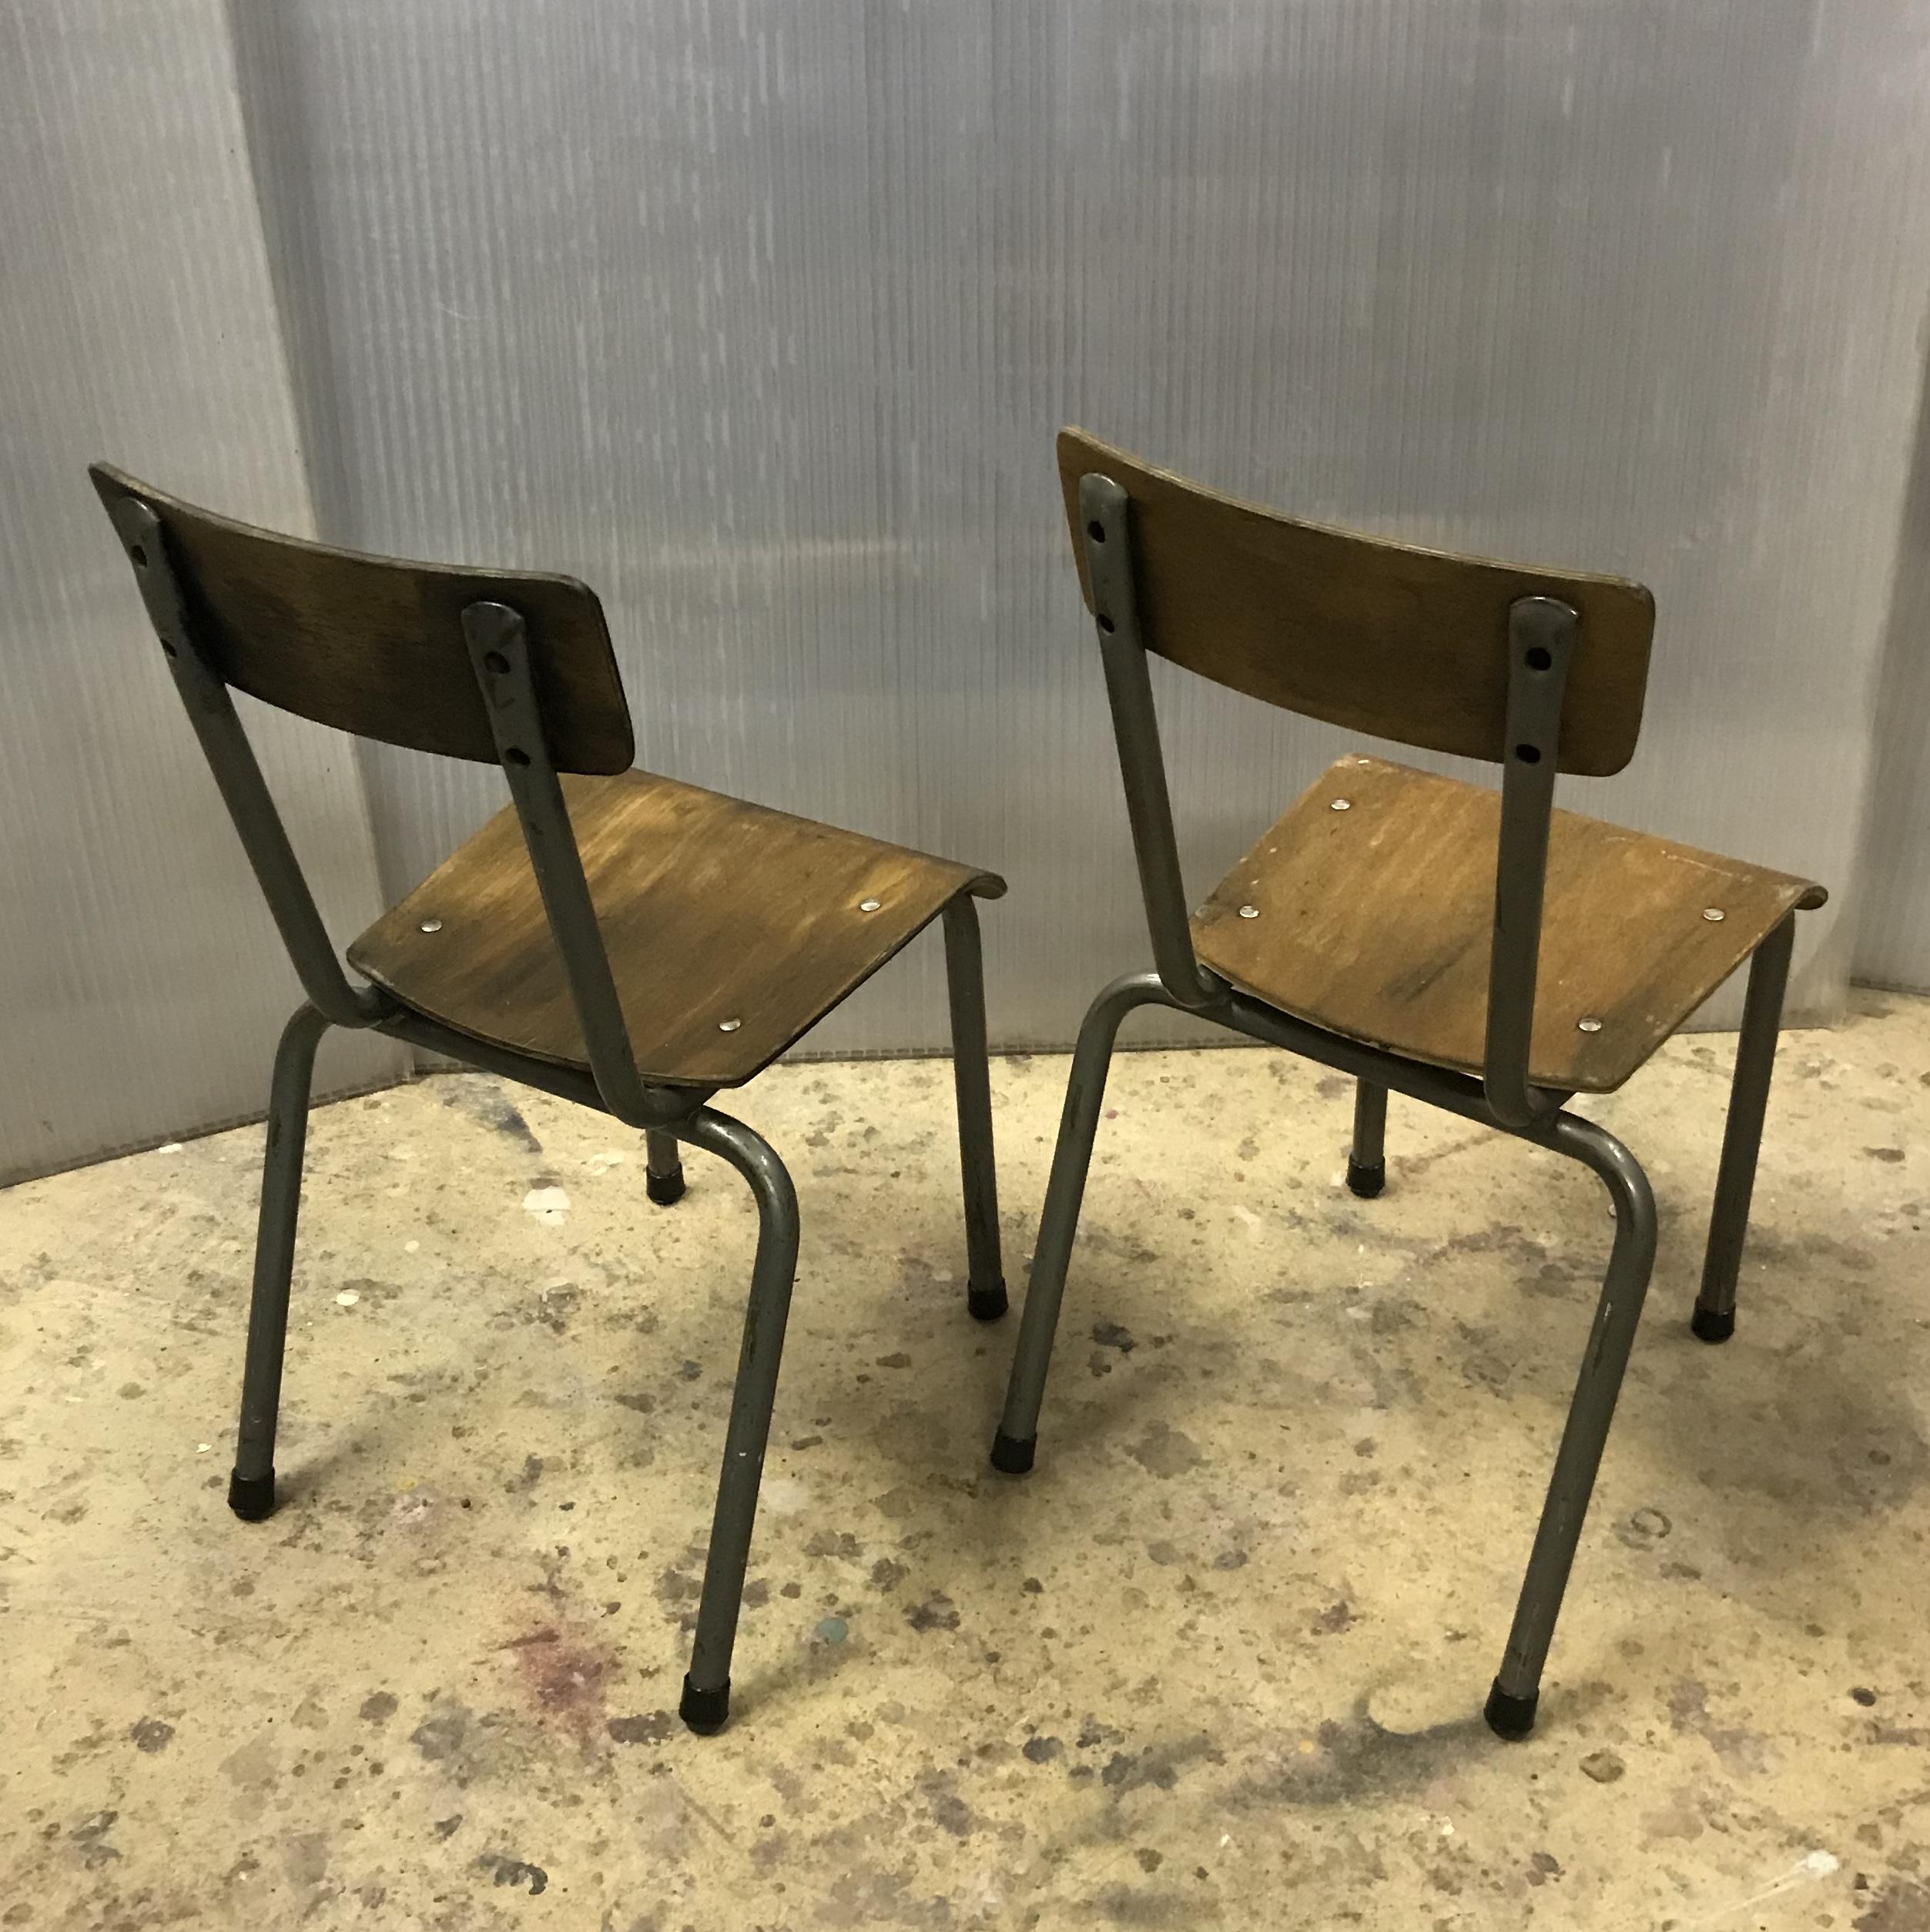 chaises d cole great interesting chaise dcole moderne chaise enfant ancienne chaisehaute. Black Bedroom Furniture Sets. Home Design Ideas